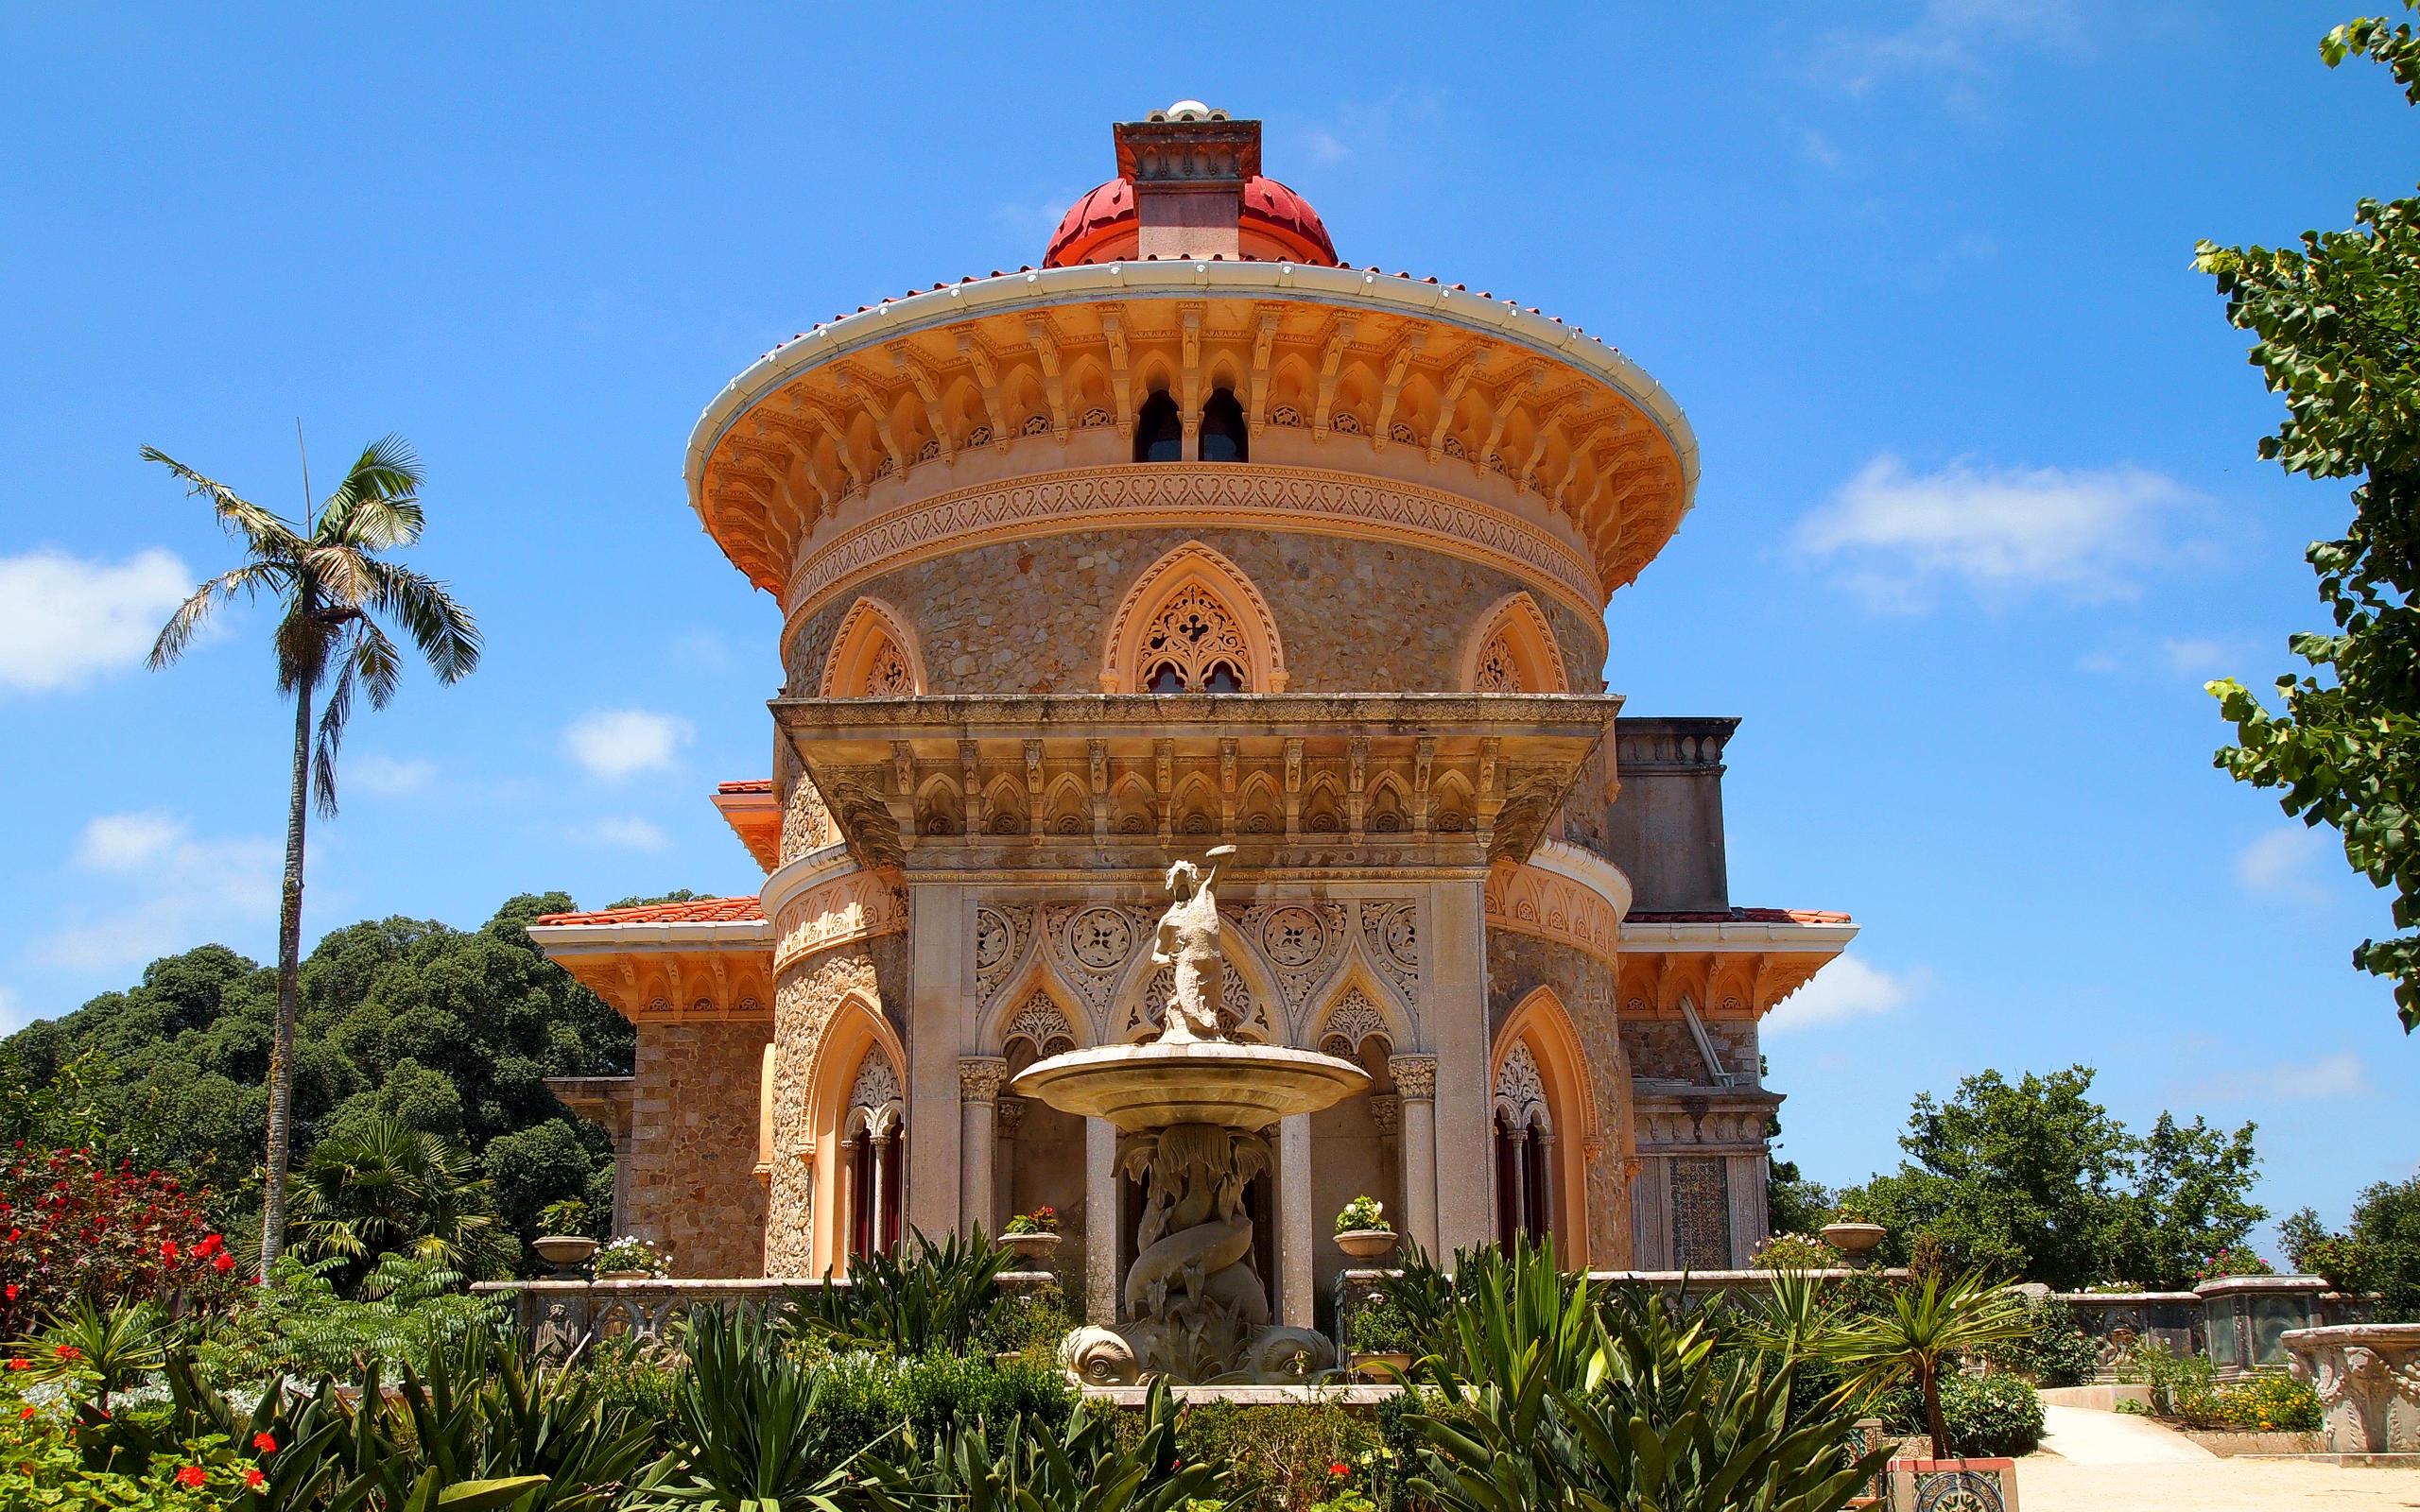 Palacio de monserrate.jpg